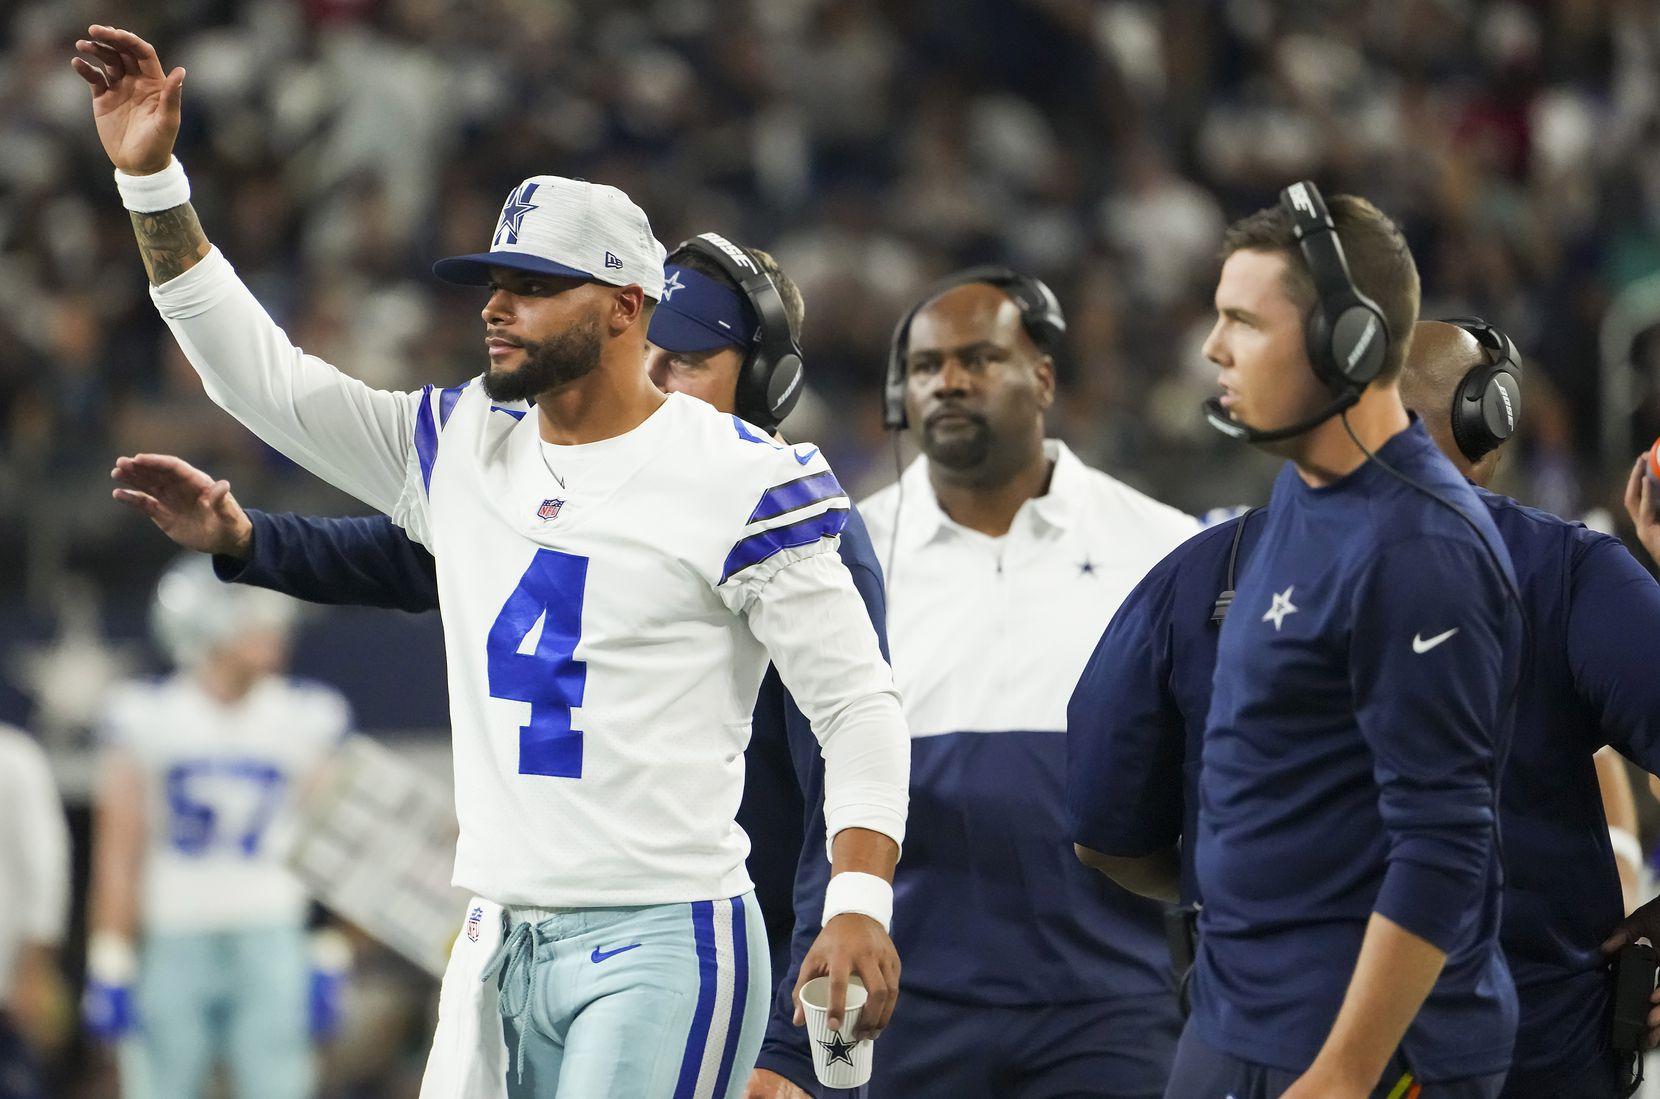 Cowboys quarterback Dak Prescott celebrated a touchdown run by running back Tony Pollard during the first half of Saturday's preseason game against the Houston Texans at AT&T Stadium in Arlington.